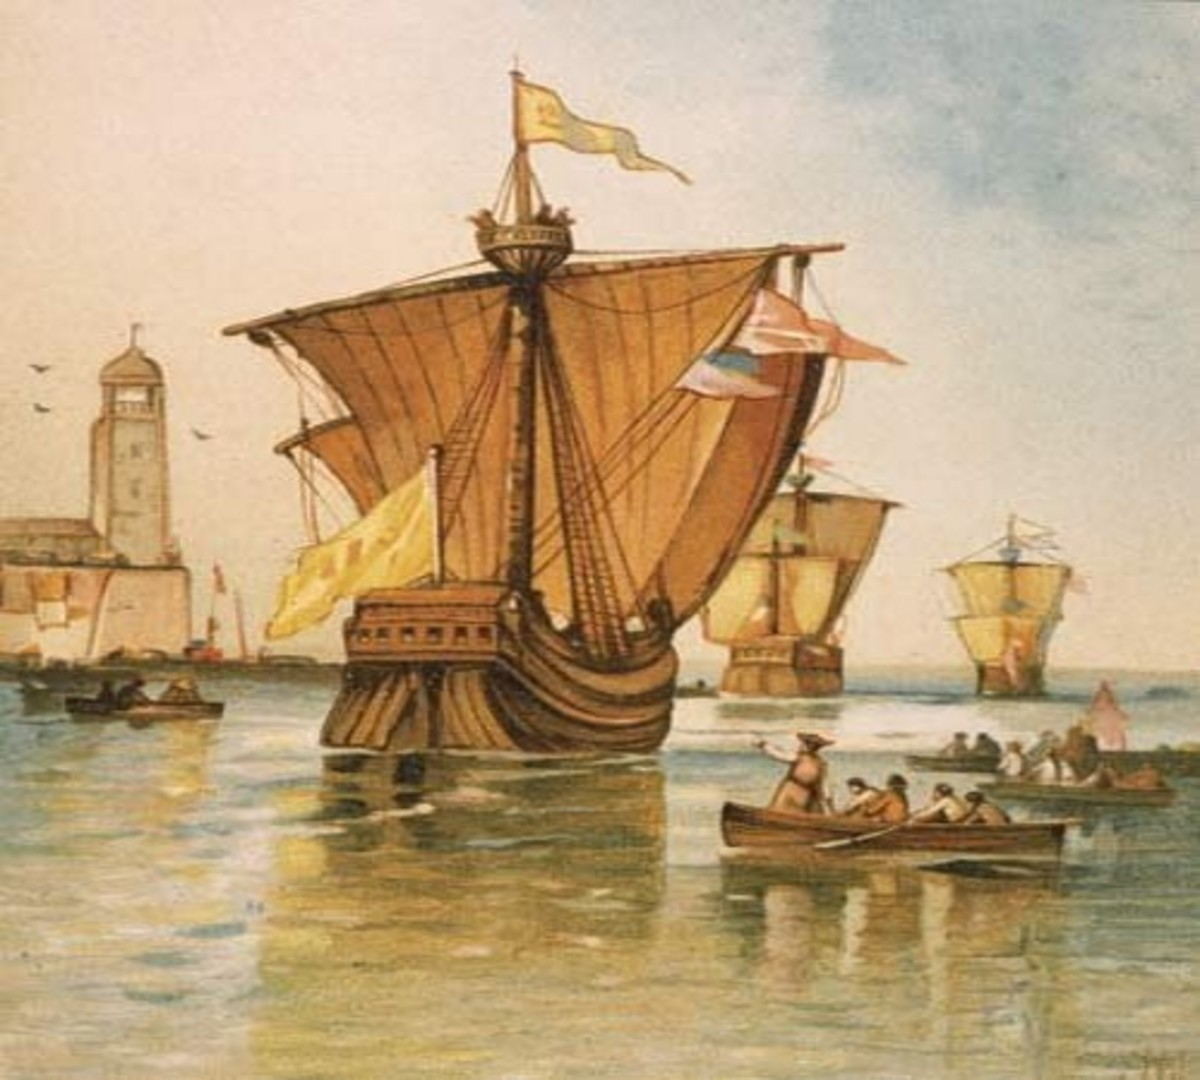 The ships Niña, Pinta, and Santa Maria